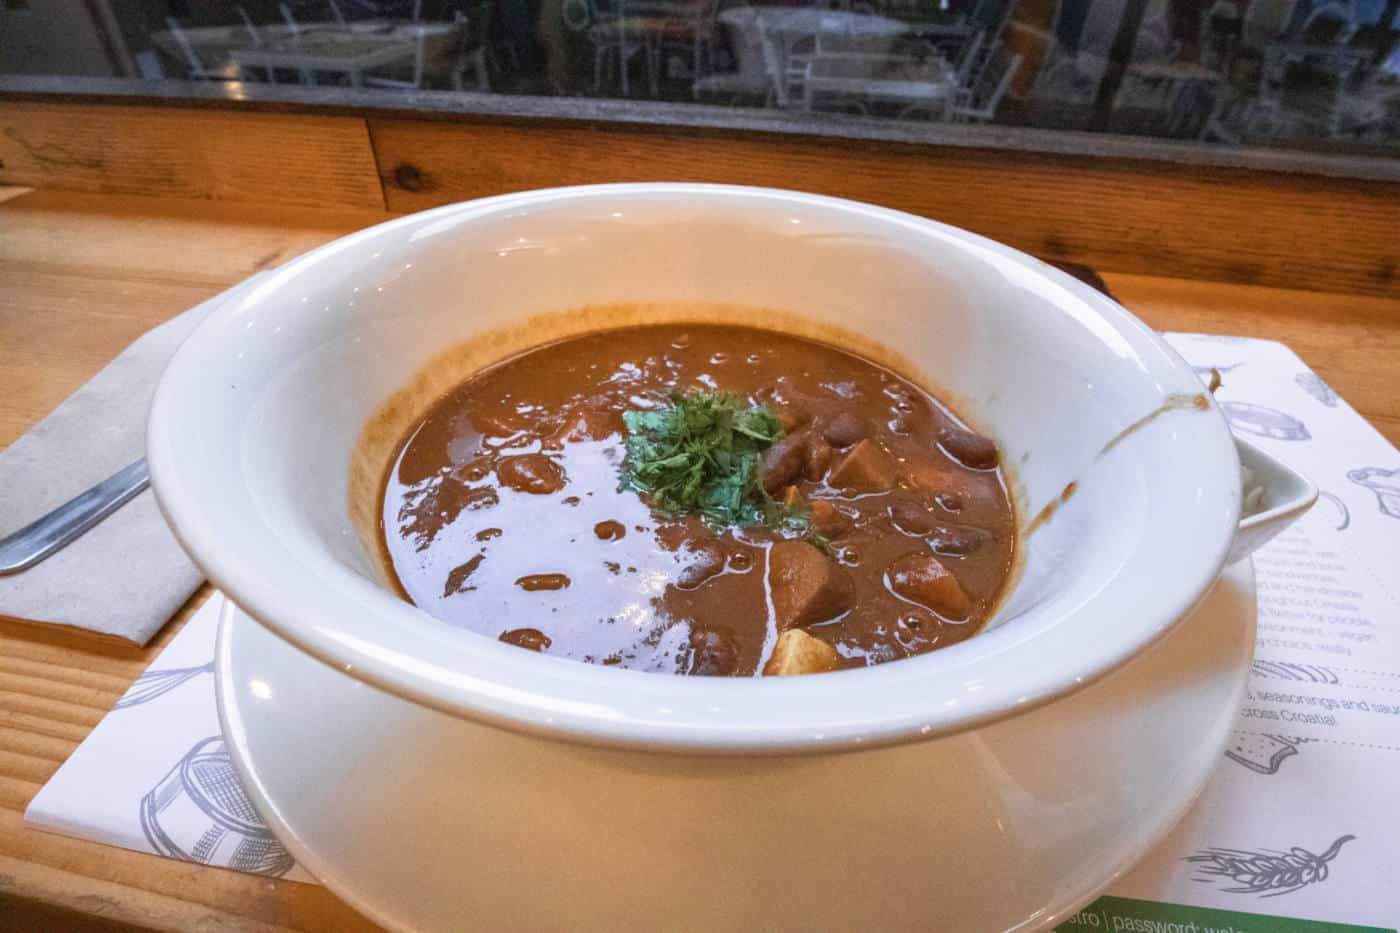 Kidney bean stew at organic vegan restaurant zrno bio bistro in Zagreb Croatia